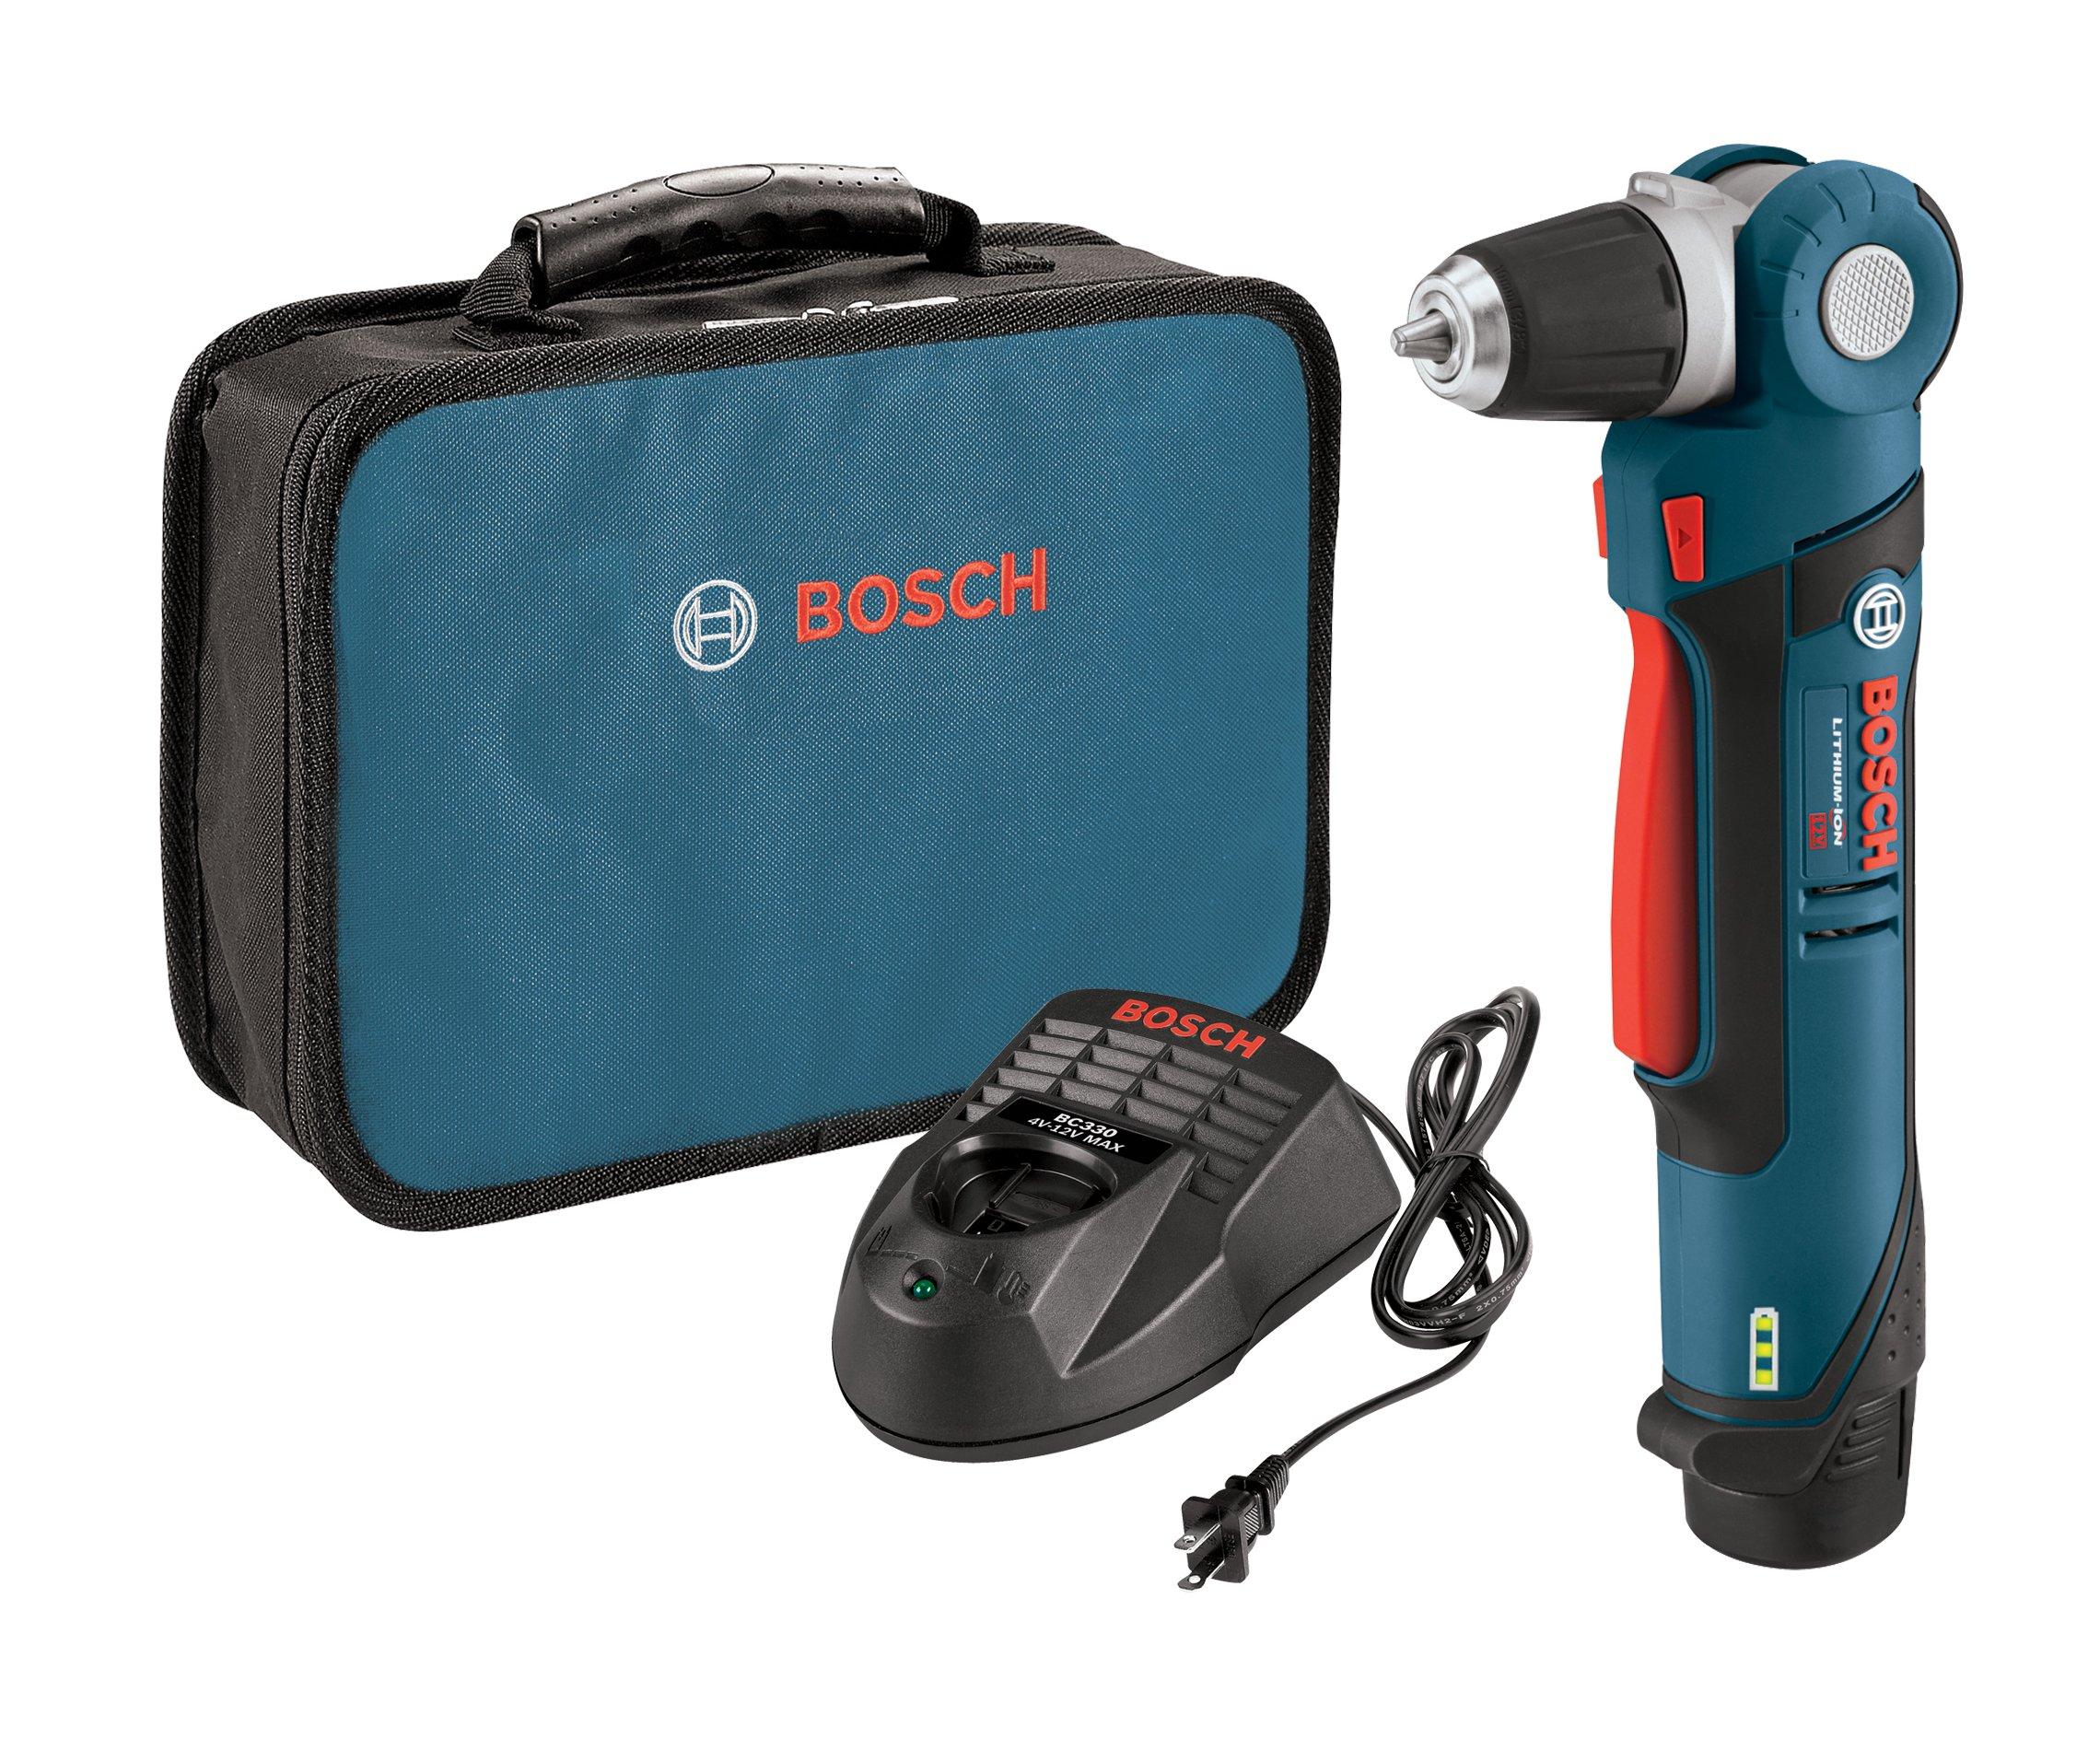 Bosch PS11 102 12 Volt Lithium Ion Capacity